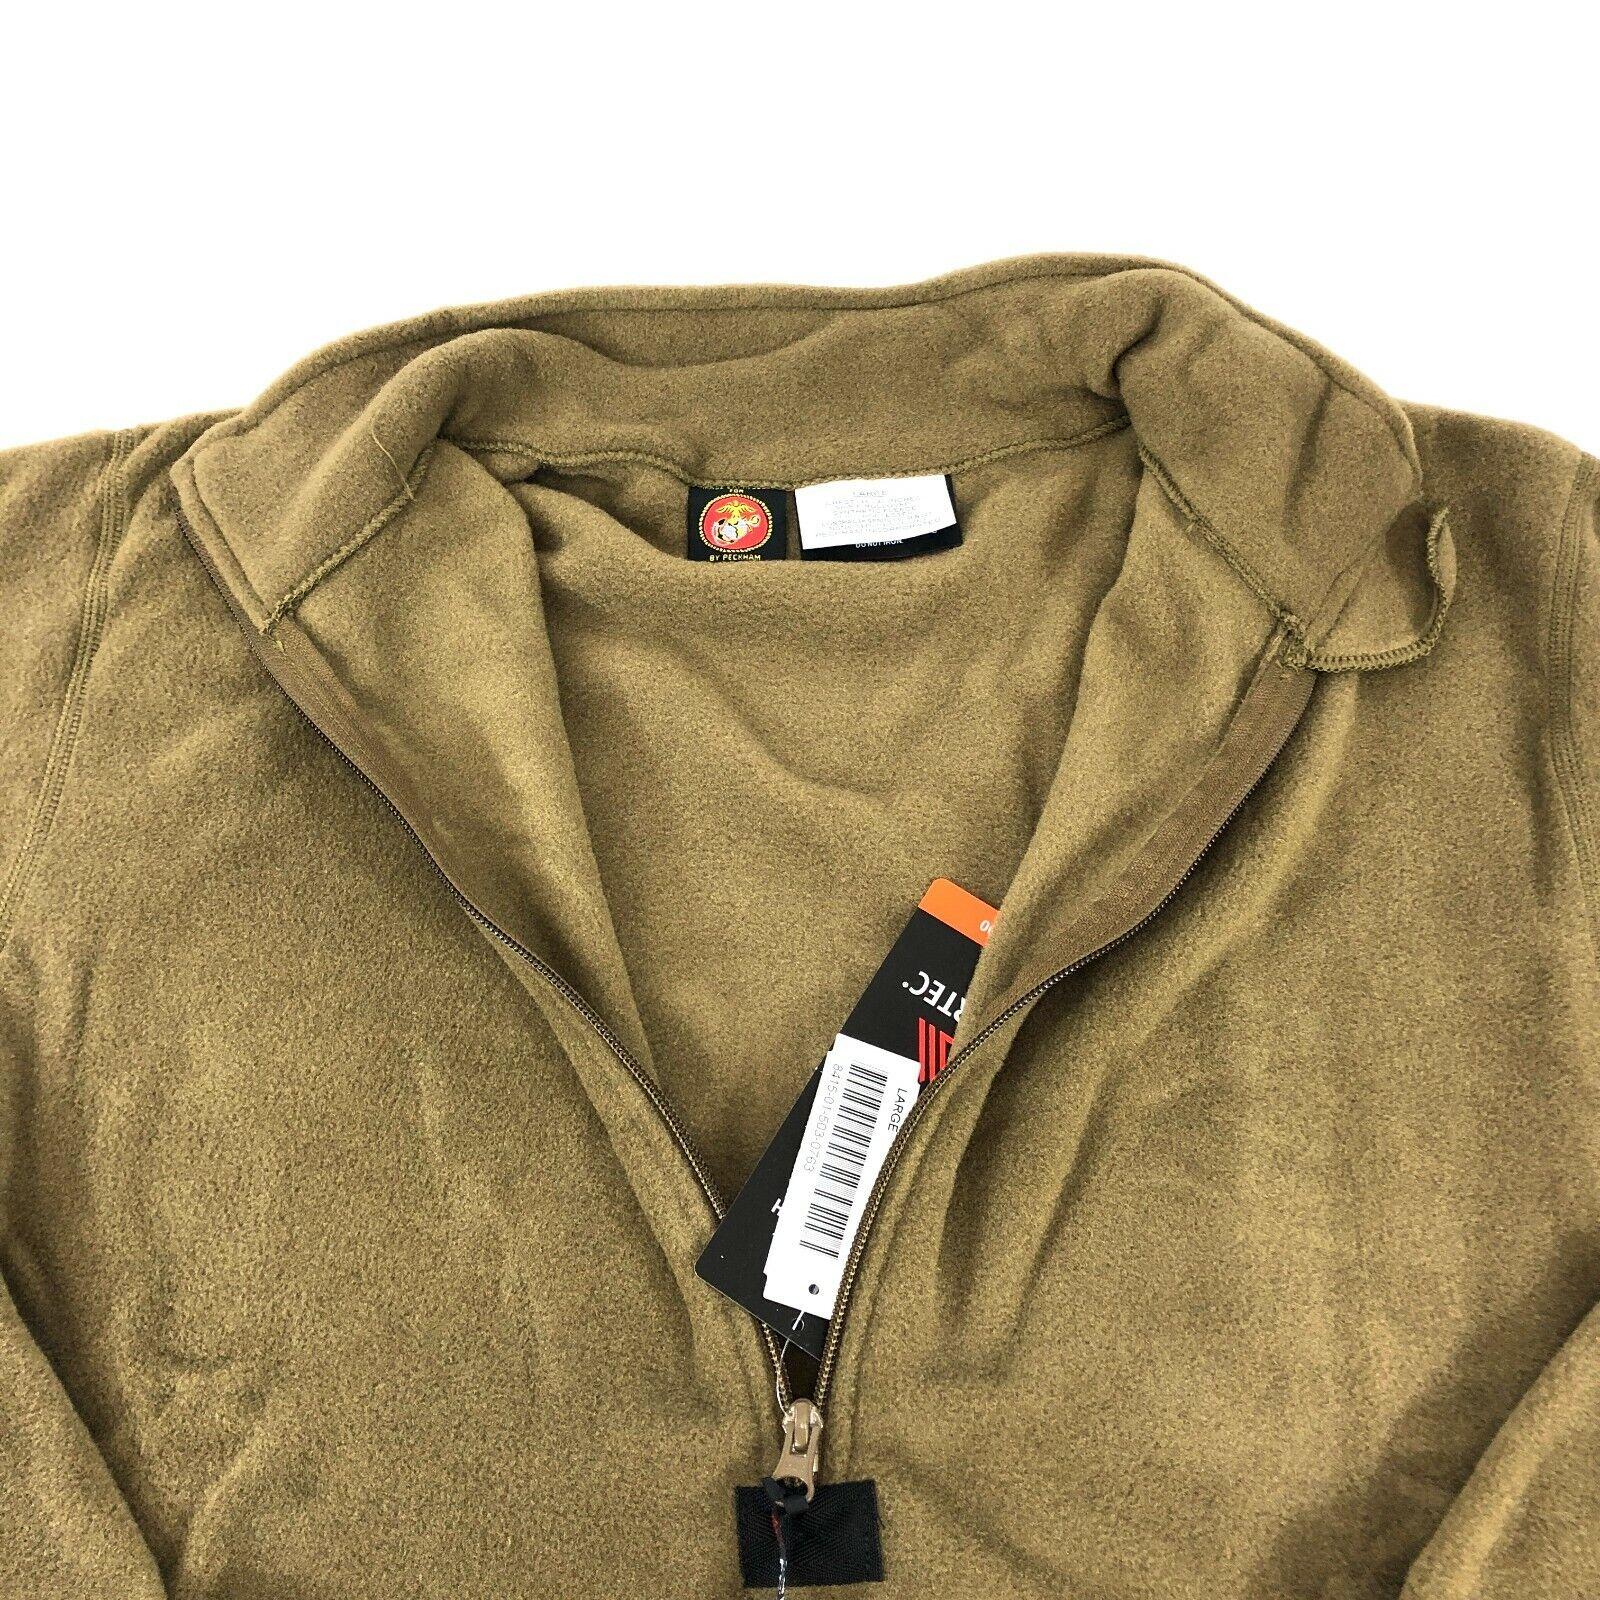 GI Brown Pullover USMC Marine Fleece Jacket Polartech 1//4 Zipper Coyote L Large